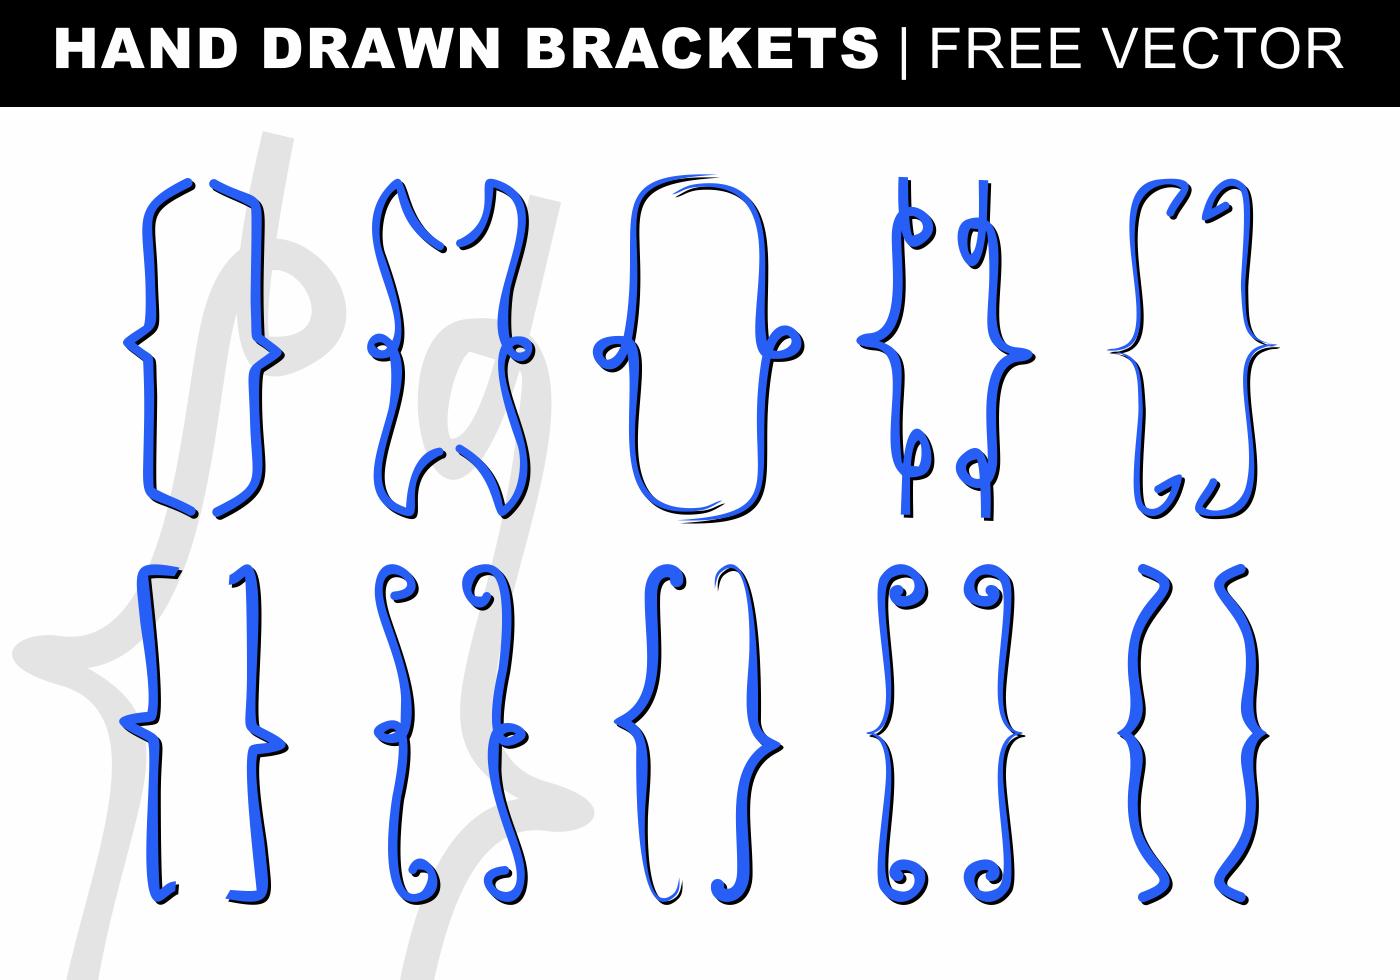 Hand Drawn Brackets Free Vector - Download Free Vectors ...